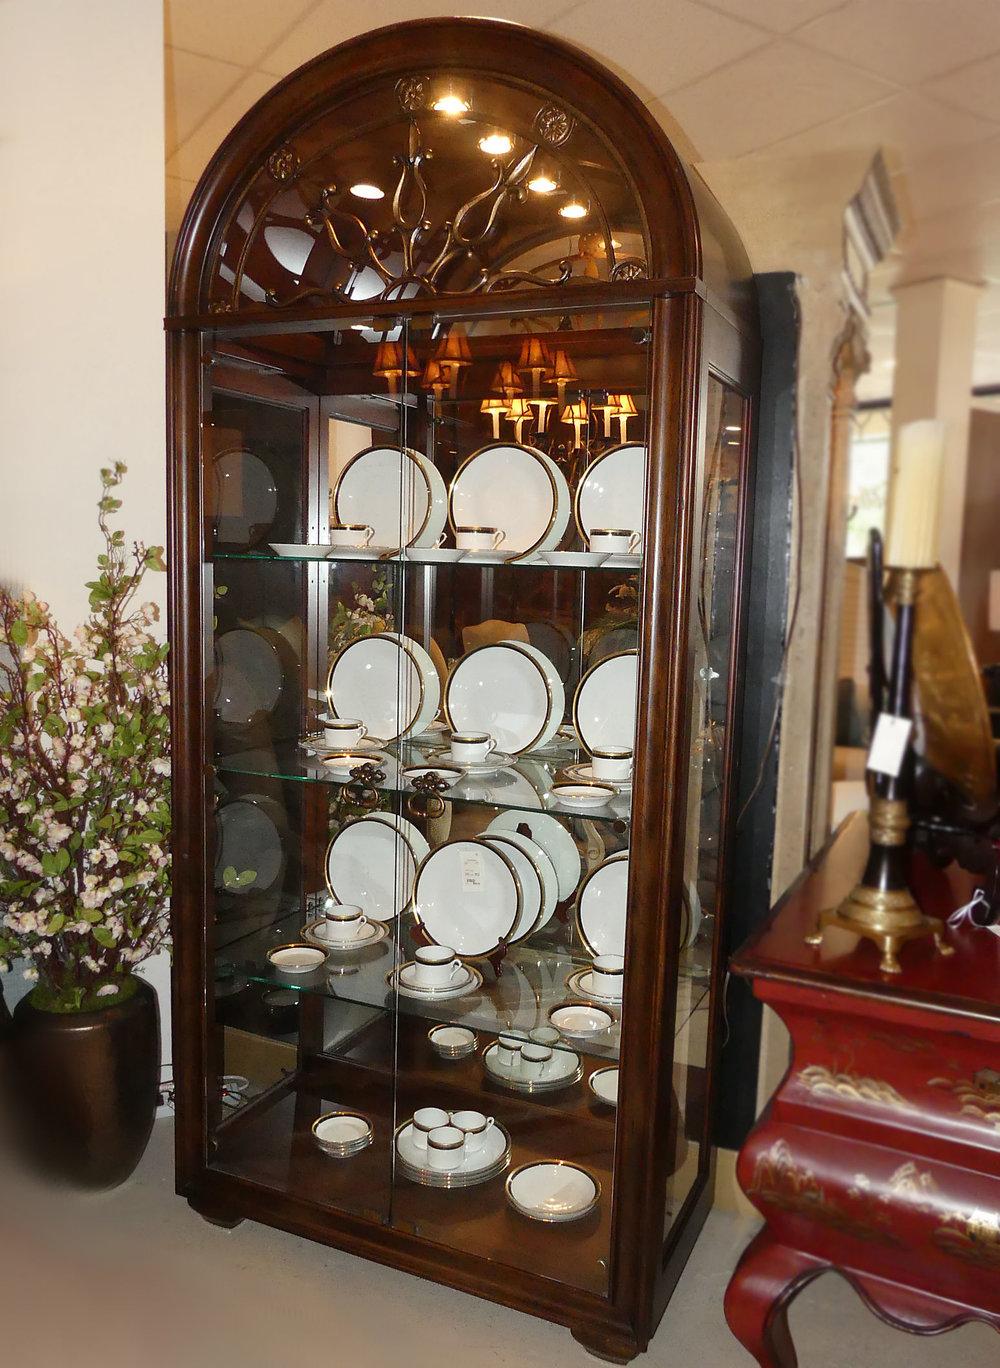 Thomasville Hills of Tuscany Bibbiano Lighted Curio Cabinet  $2,495